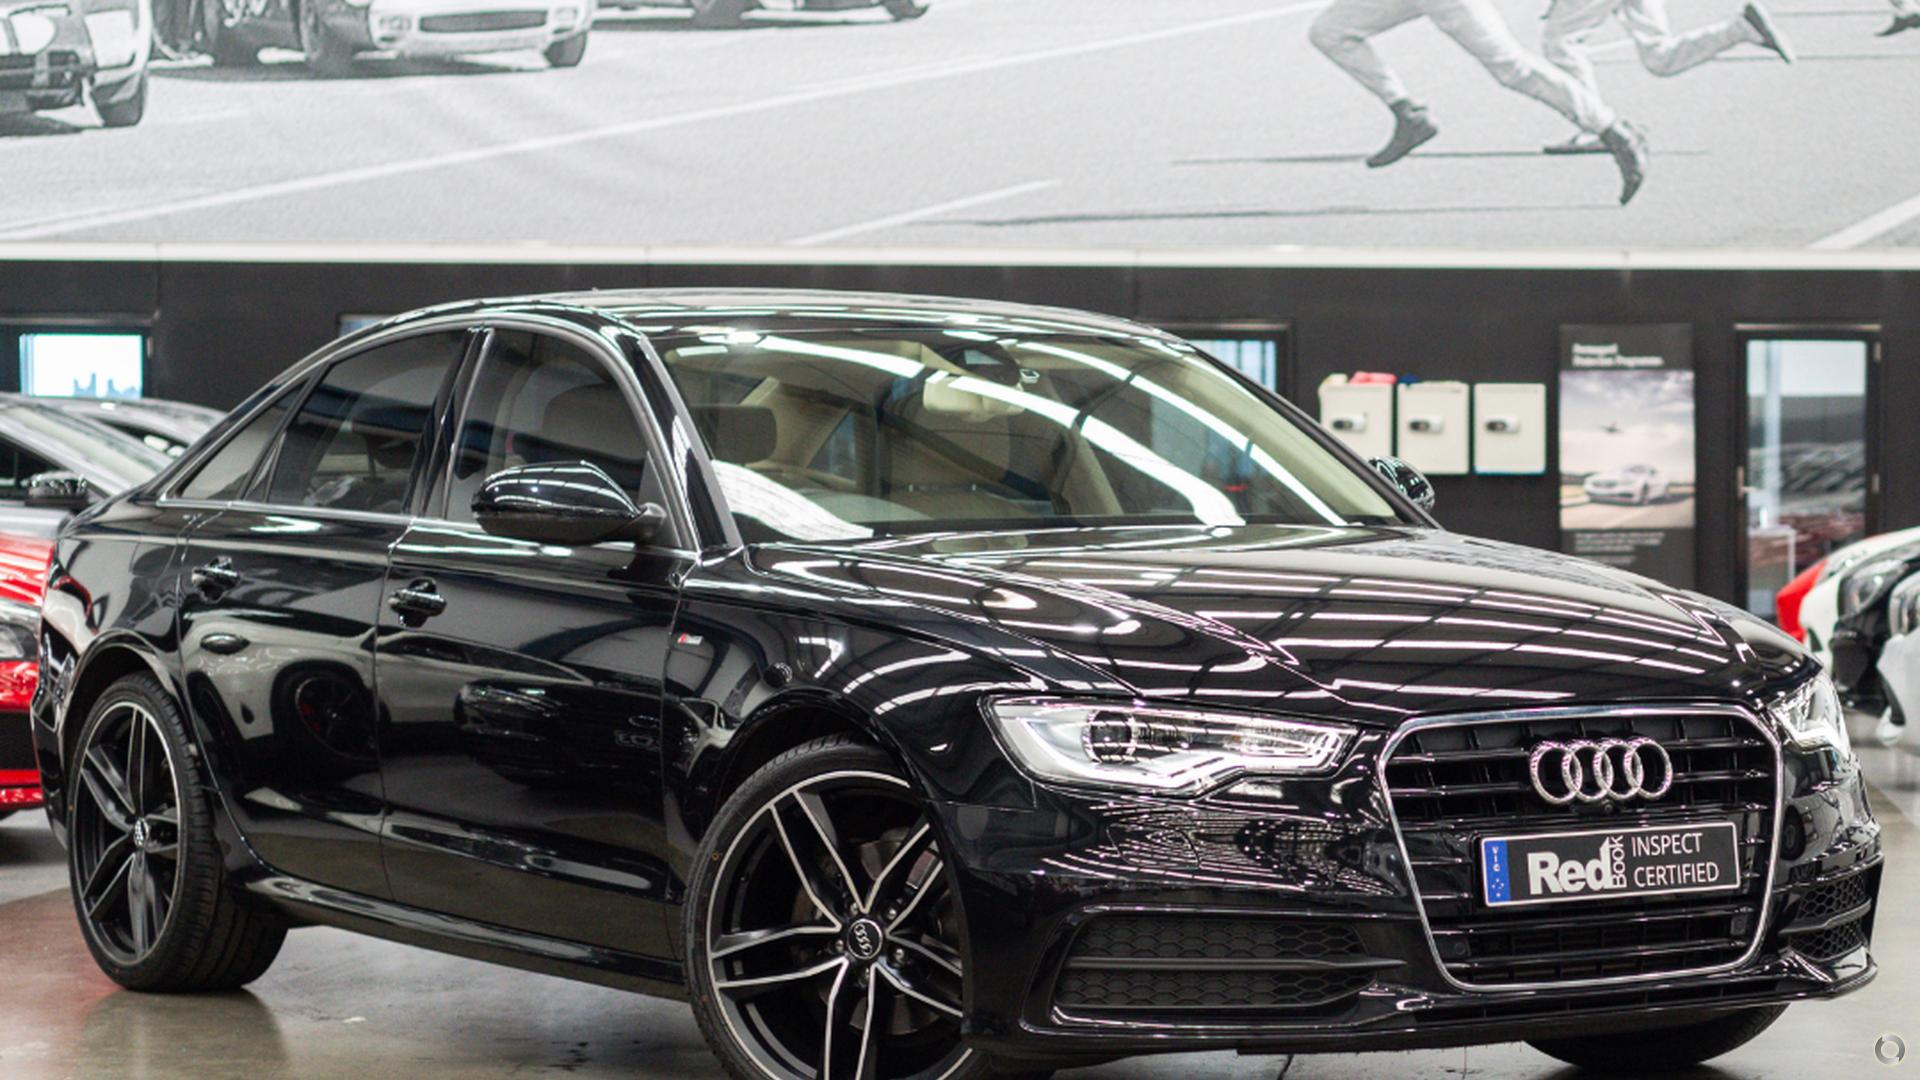 2014 Audi A6 C7 - Ezyauto Prestige